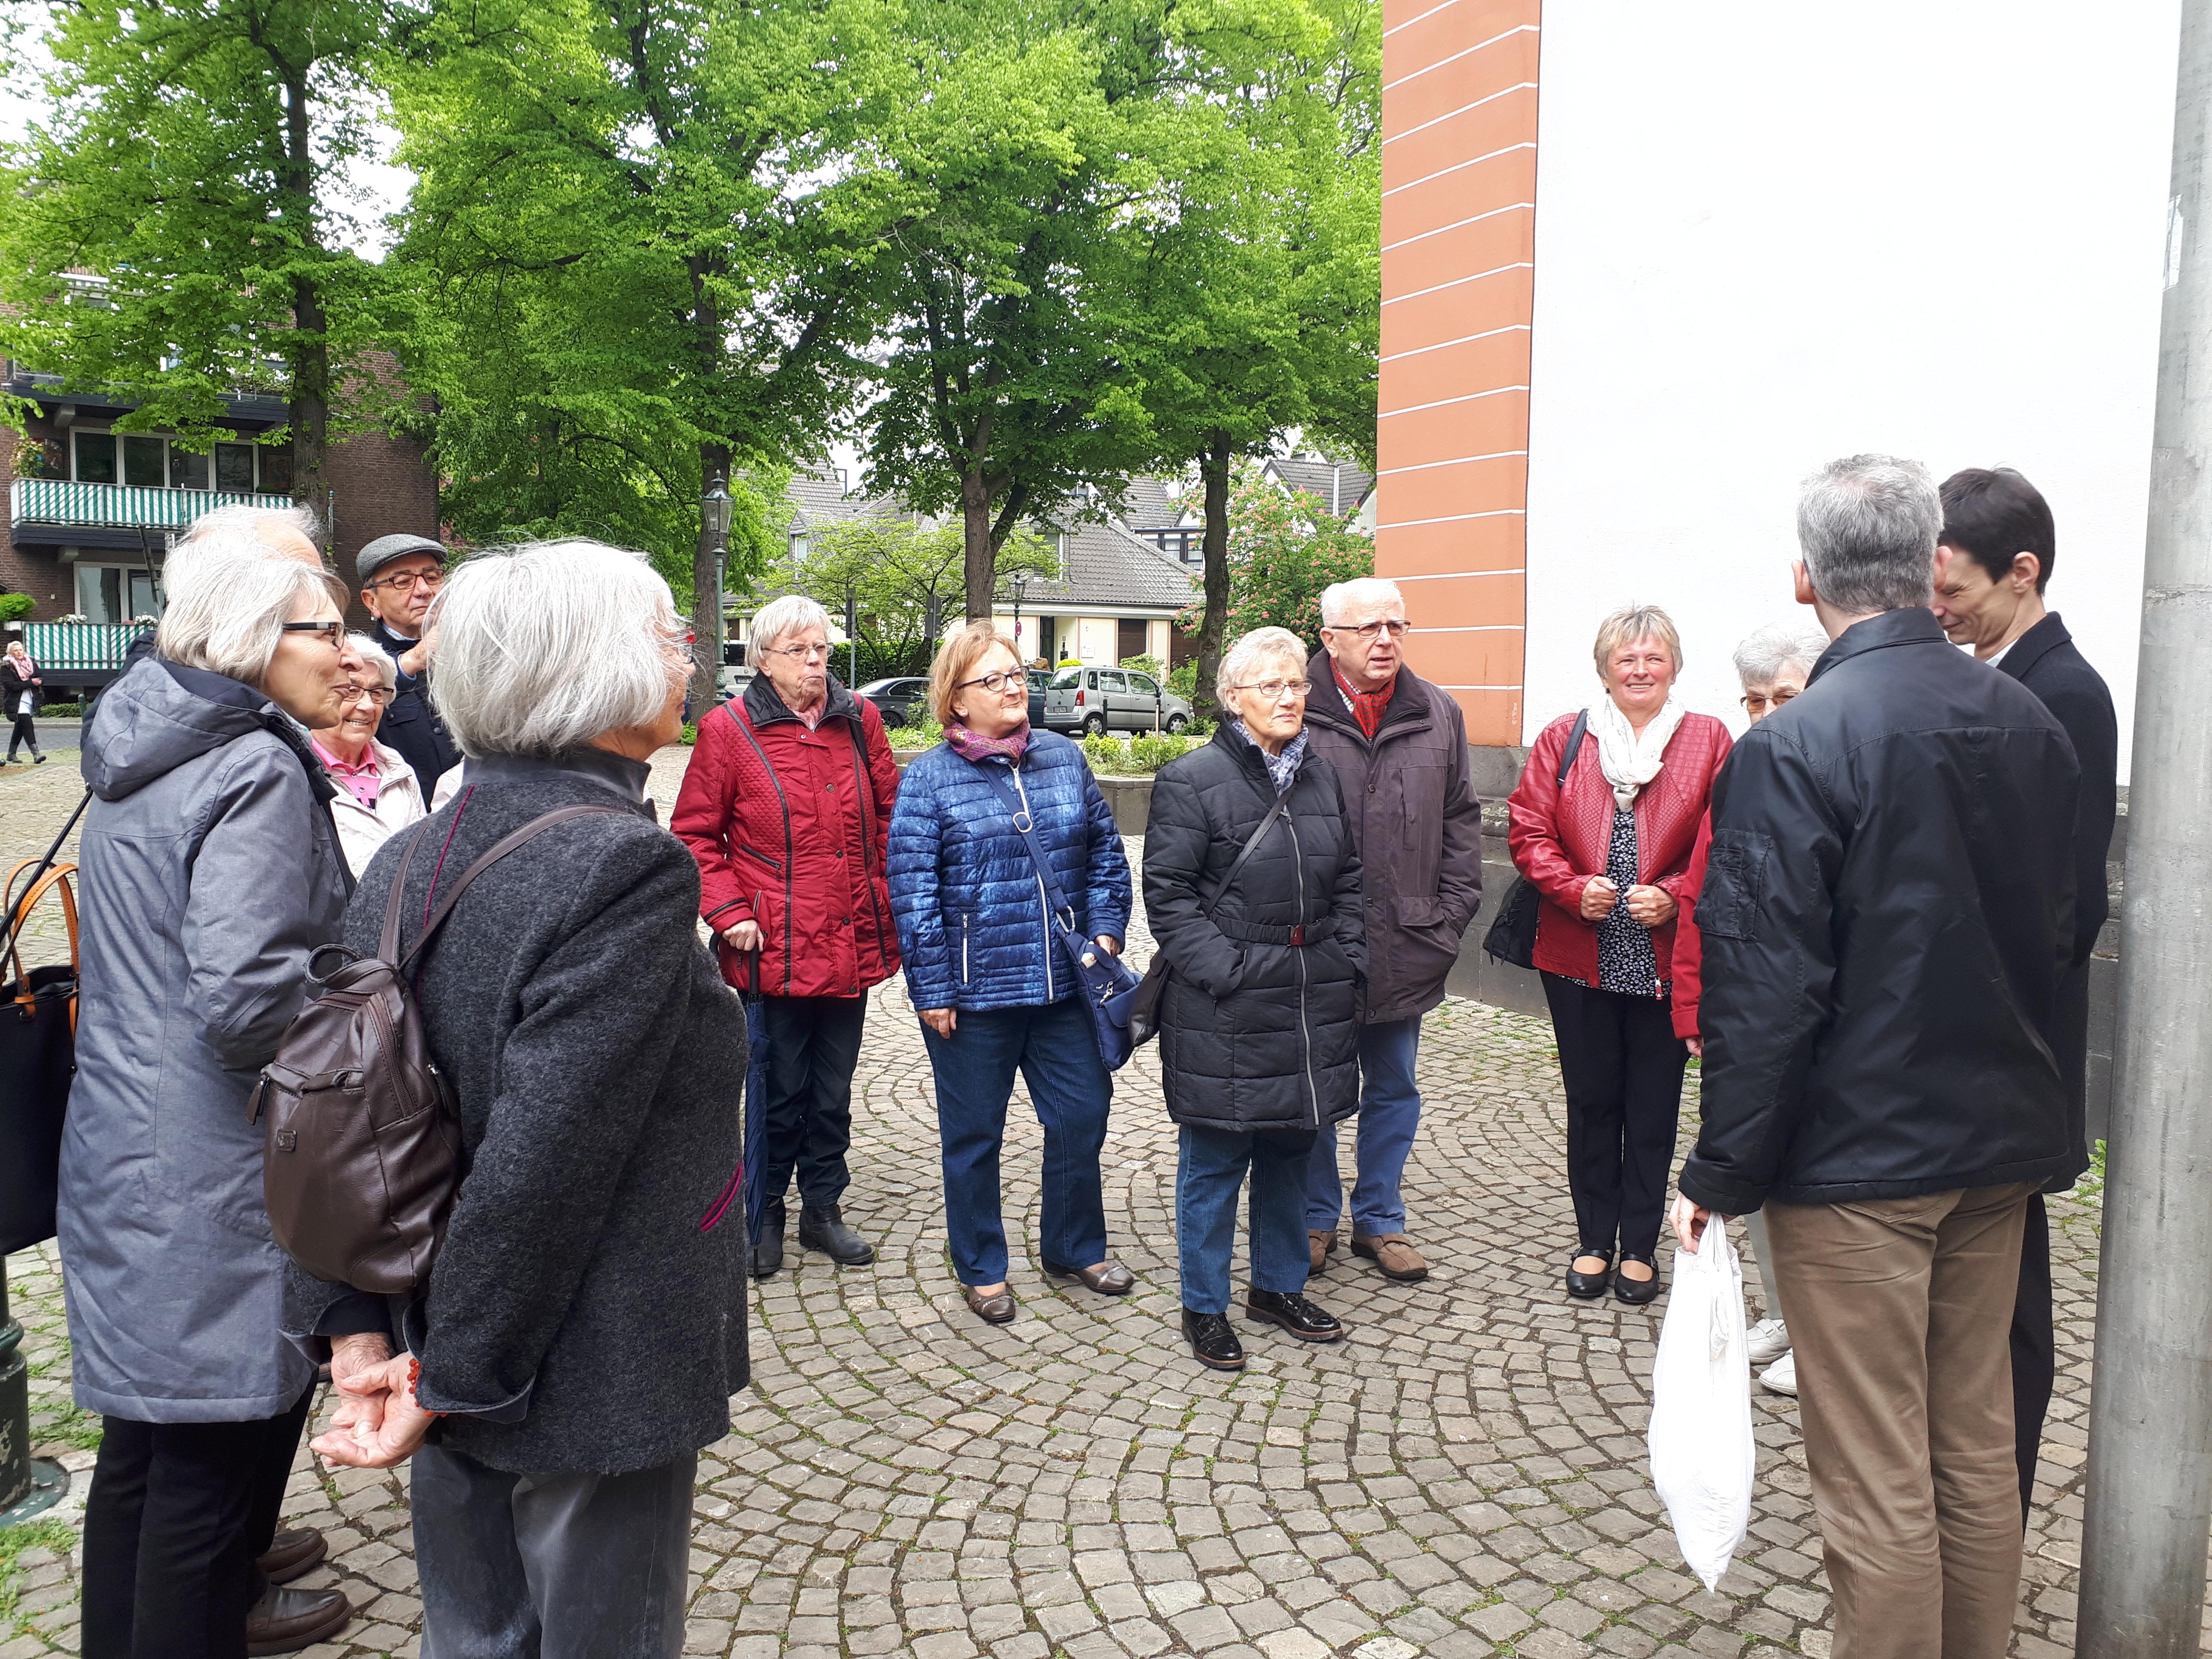 Kolping-Jahresausflug nach Düsseldorf-Gerresheim